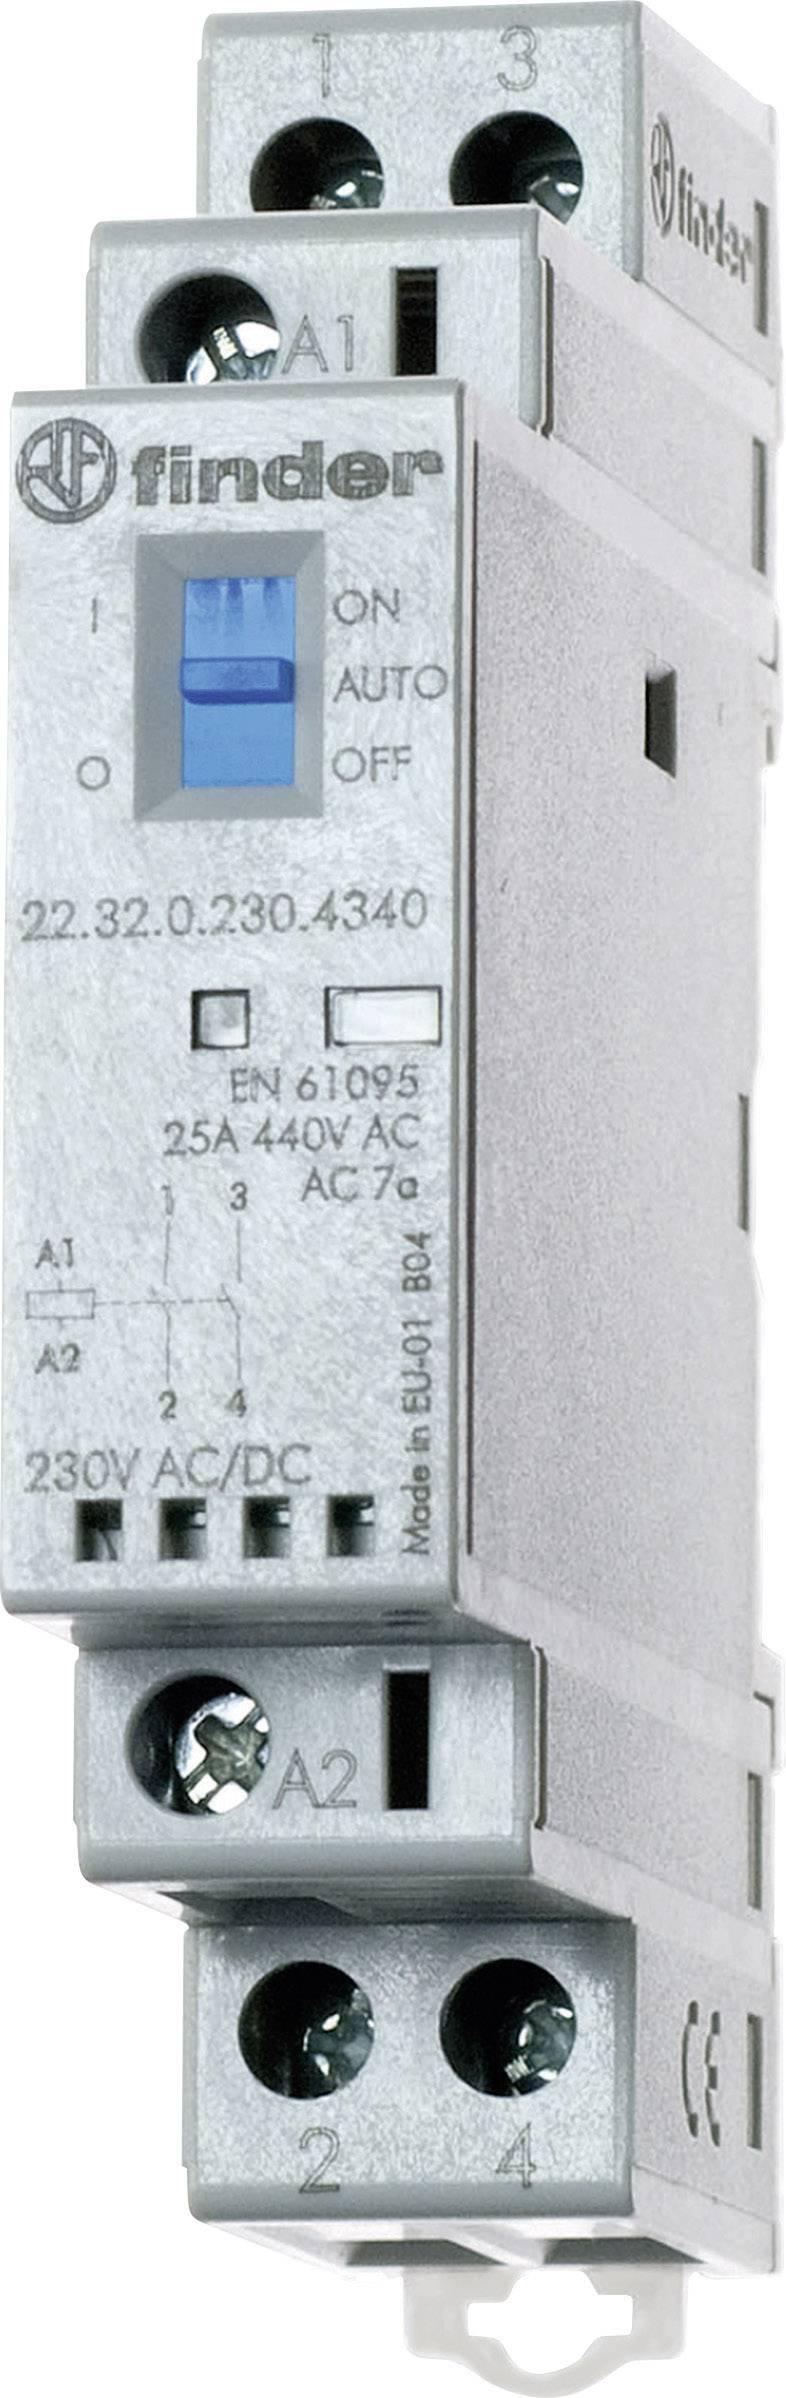 Stykač Finder 22.32.0.230.1420, 230 V/DC, 230 V/AC, 25 A, 1 ks